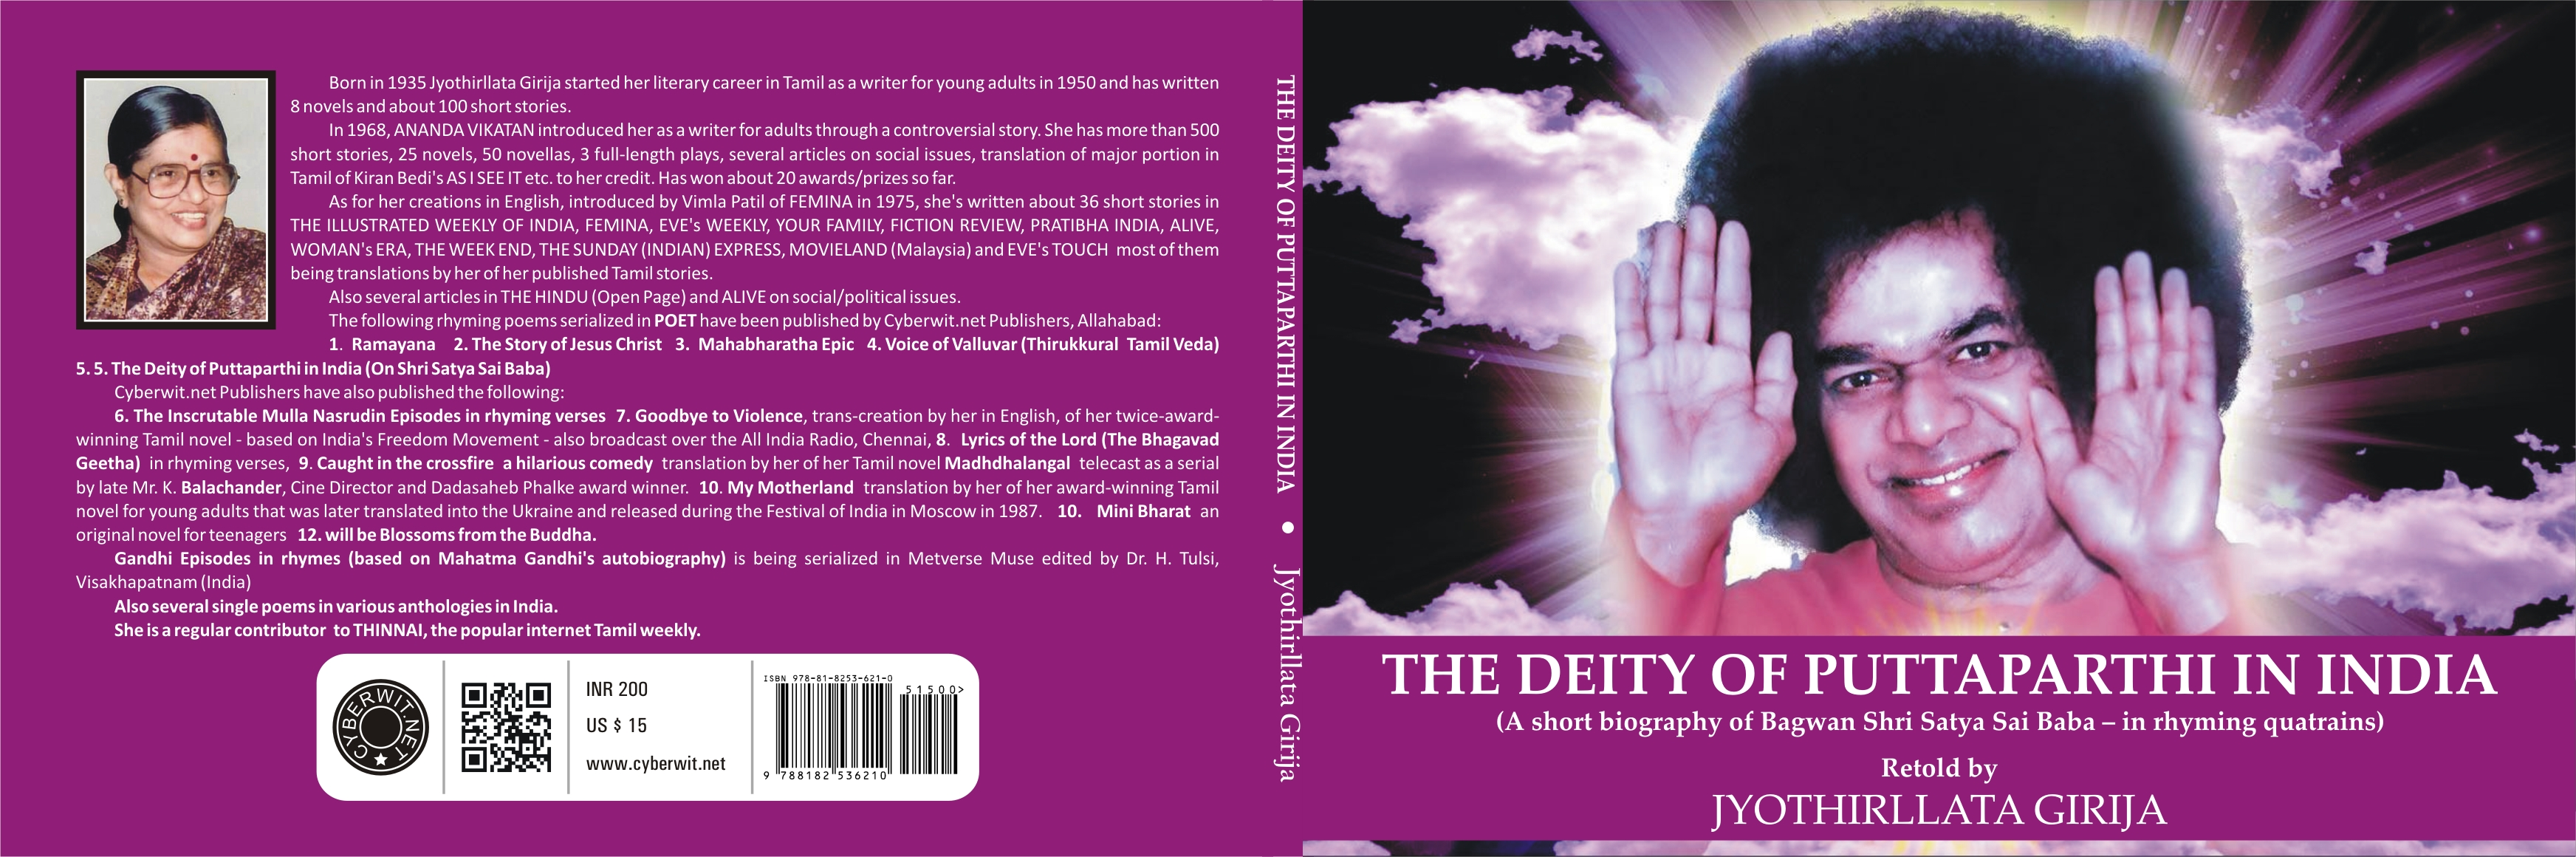 The Deity of Puttaparthi in India